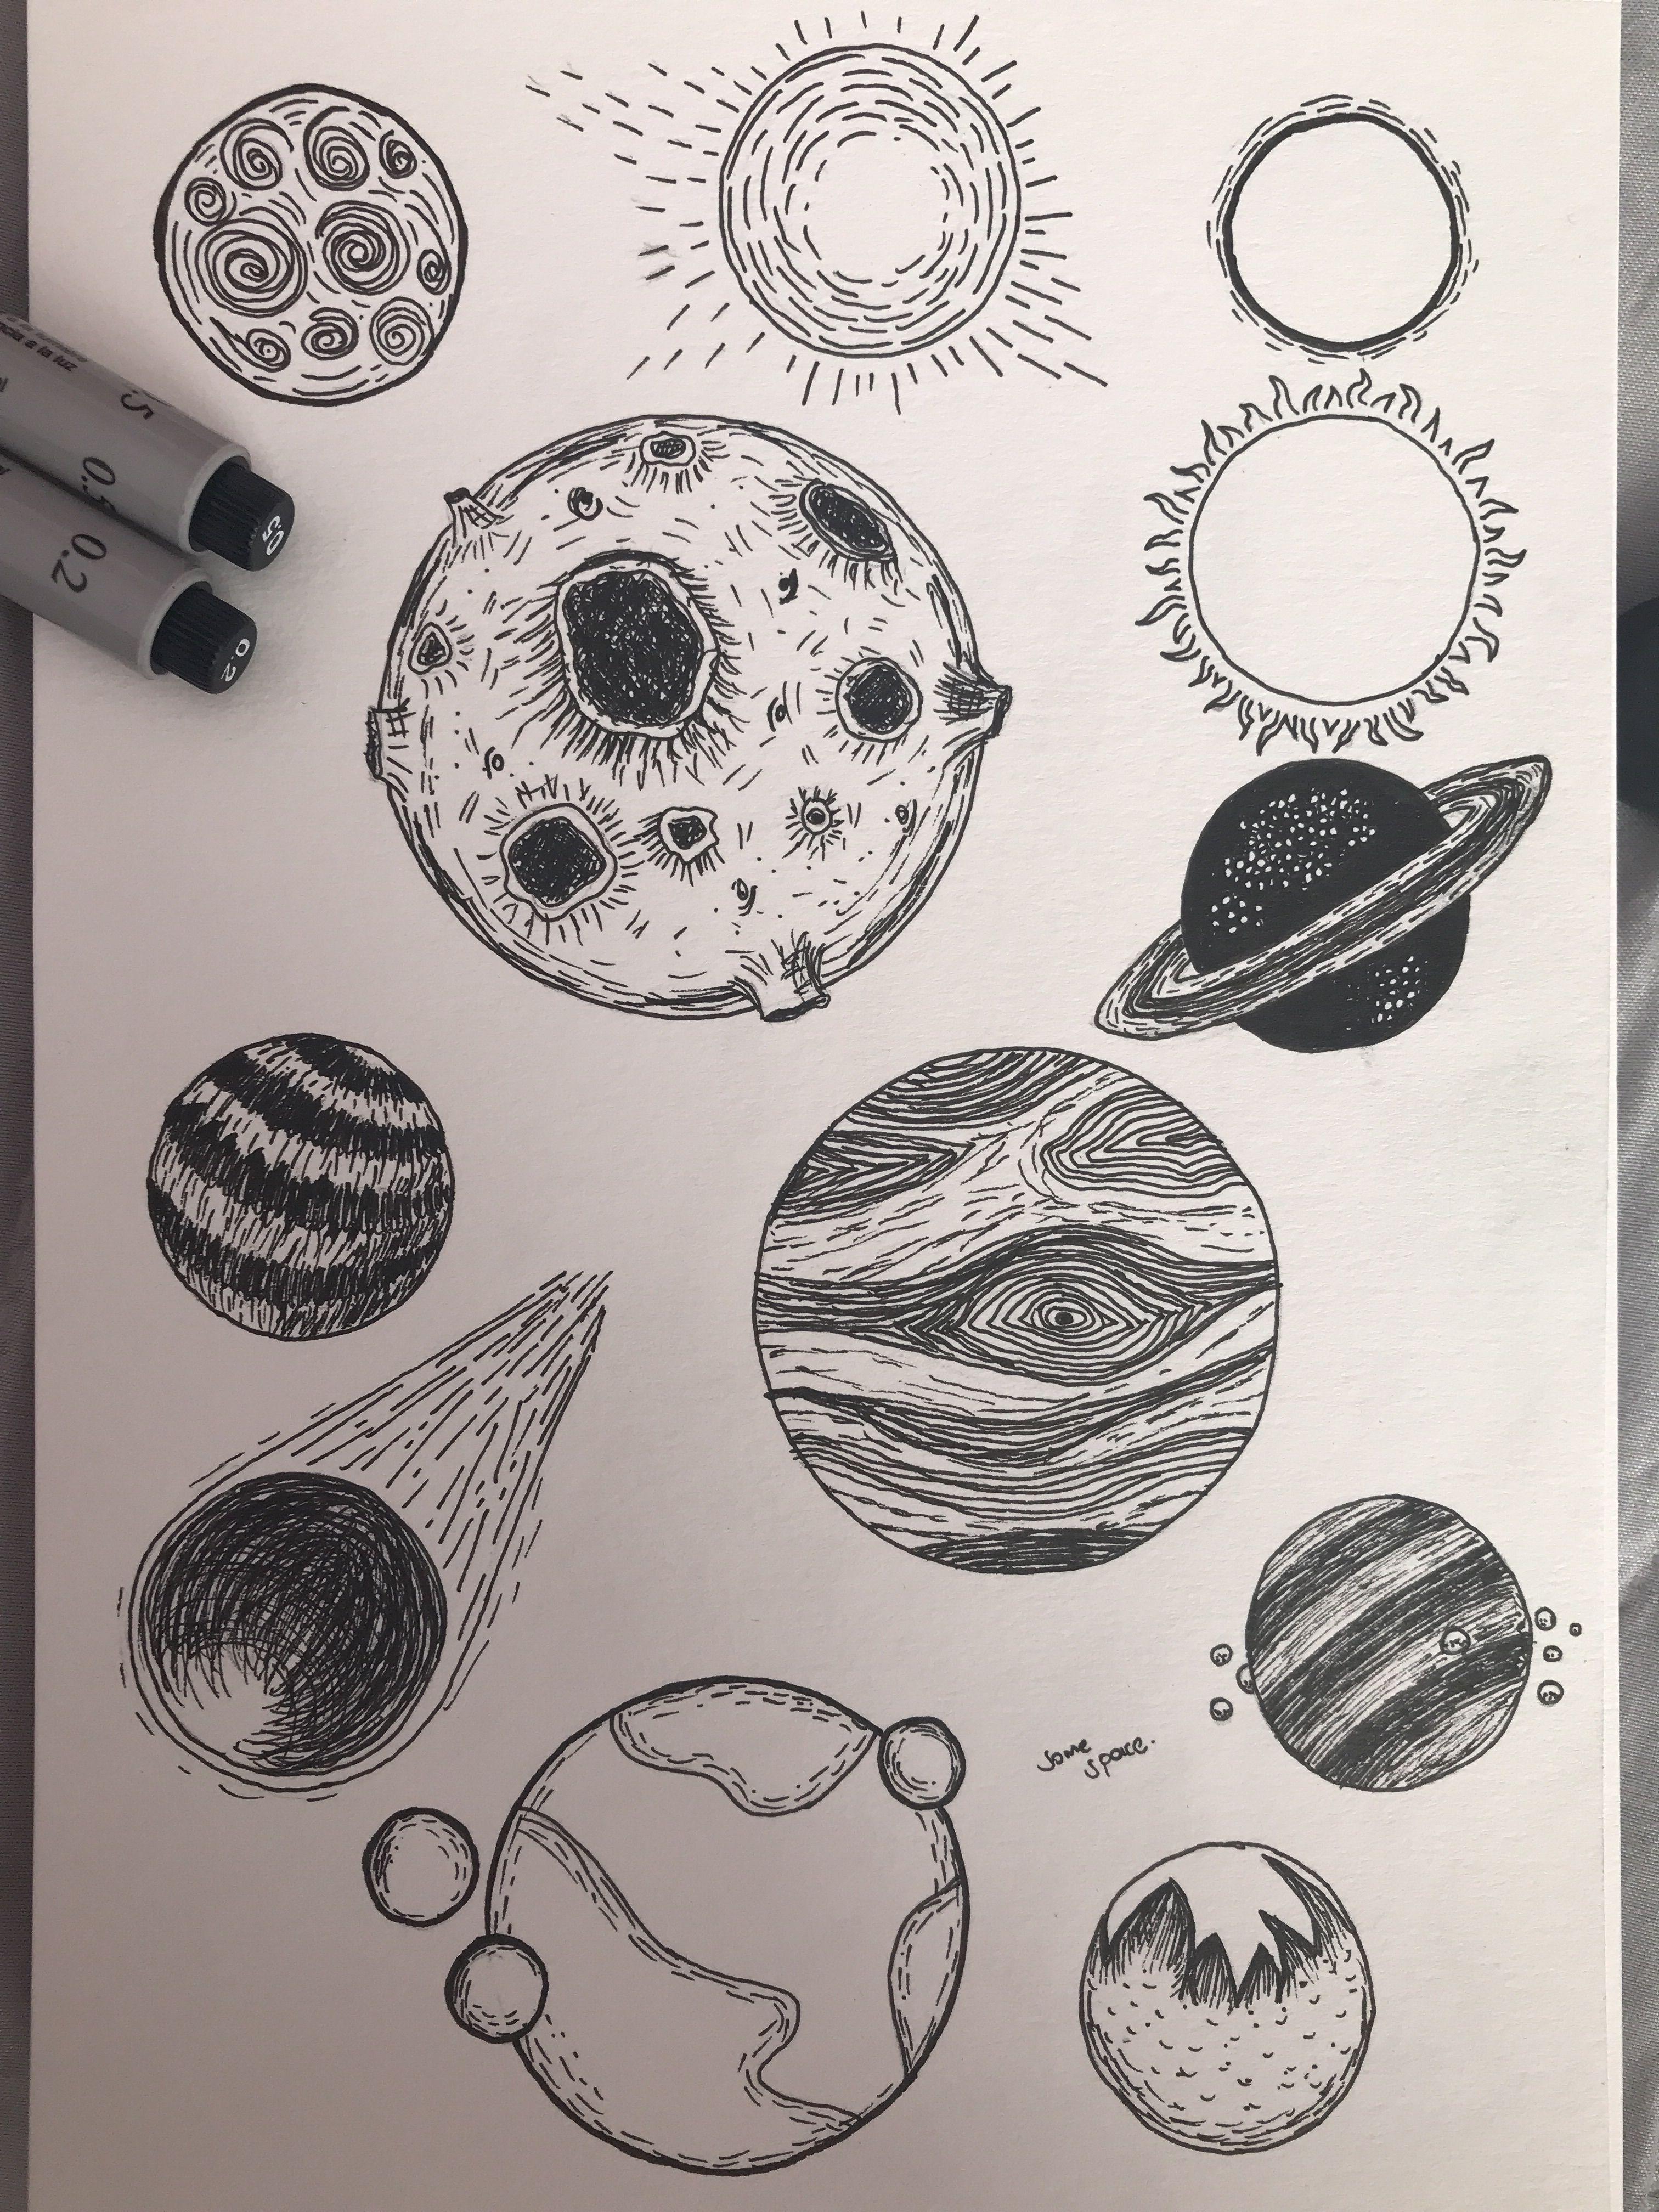 image free Ink planets art in. Uranus drawing pen.